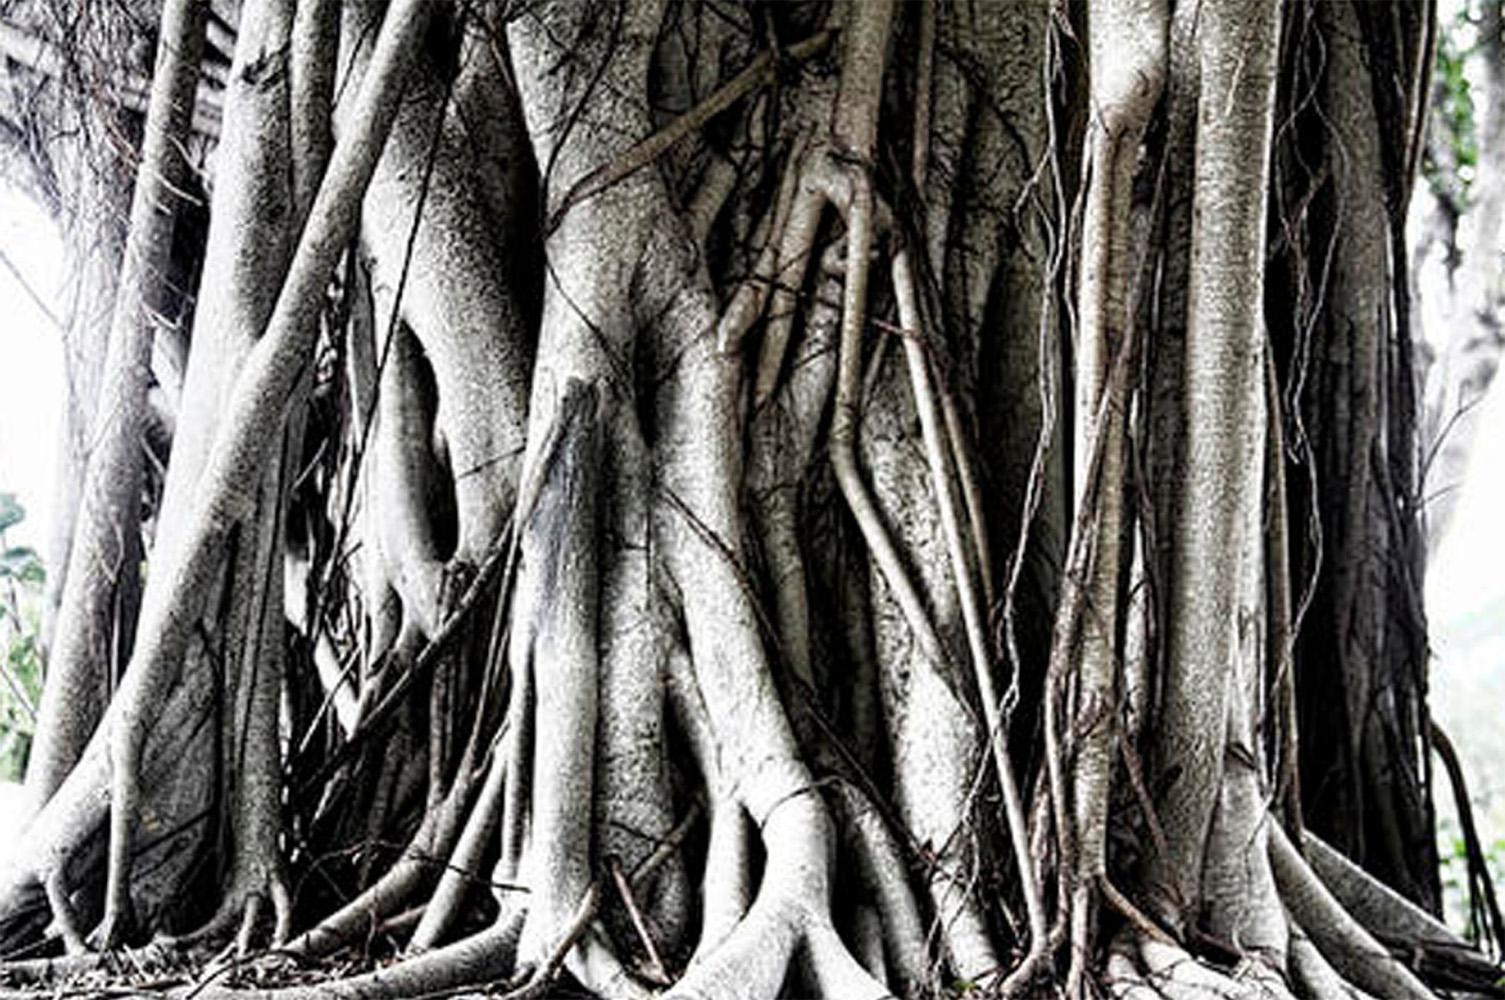 Mangrove_Bar_Inspiration 2.jpg